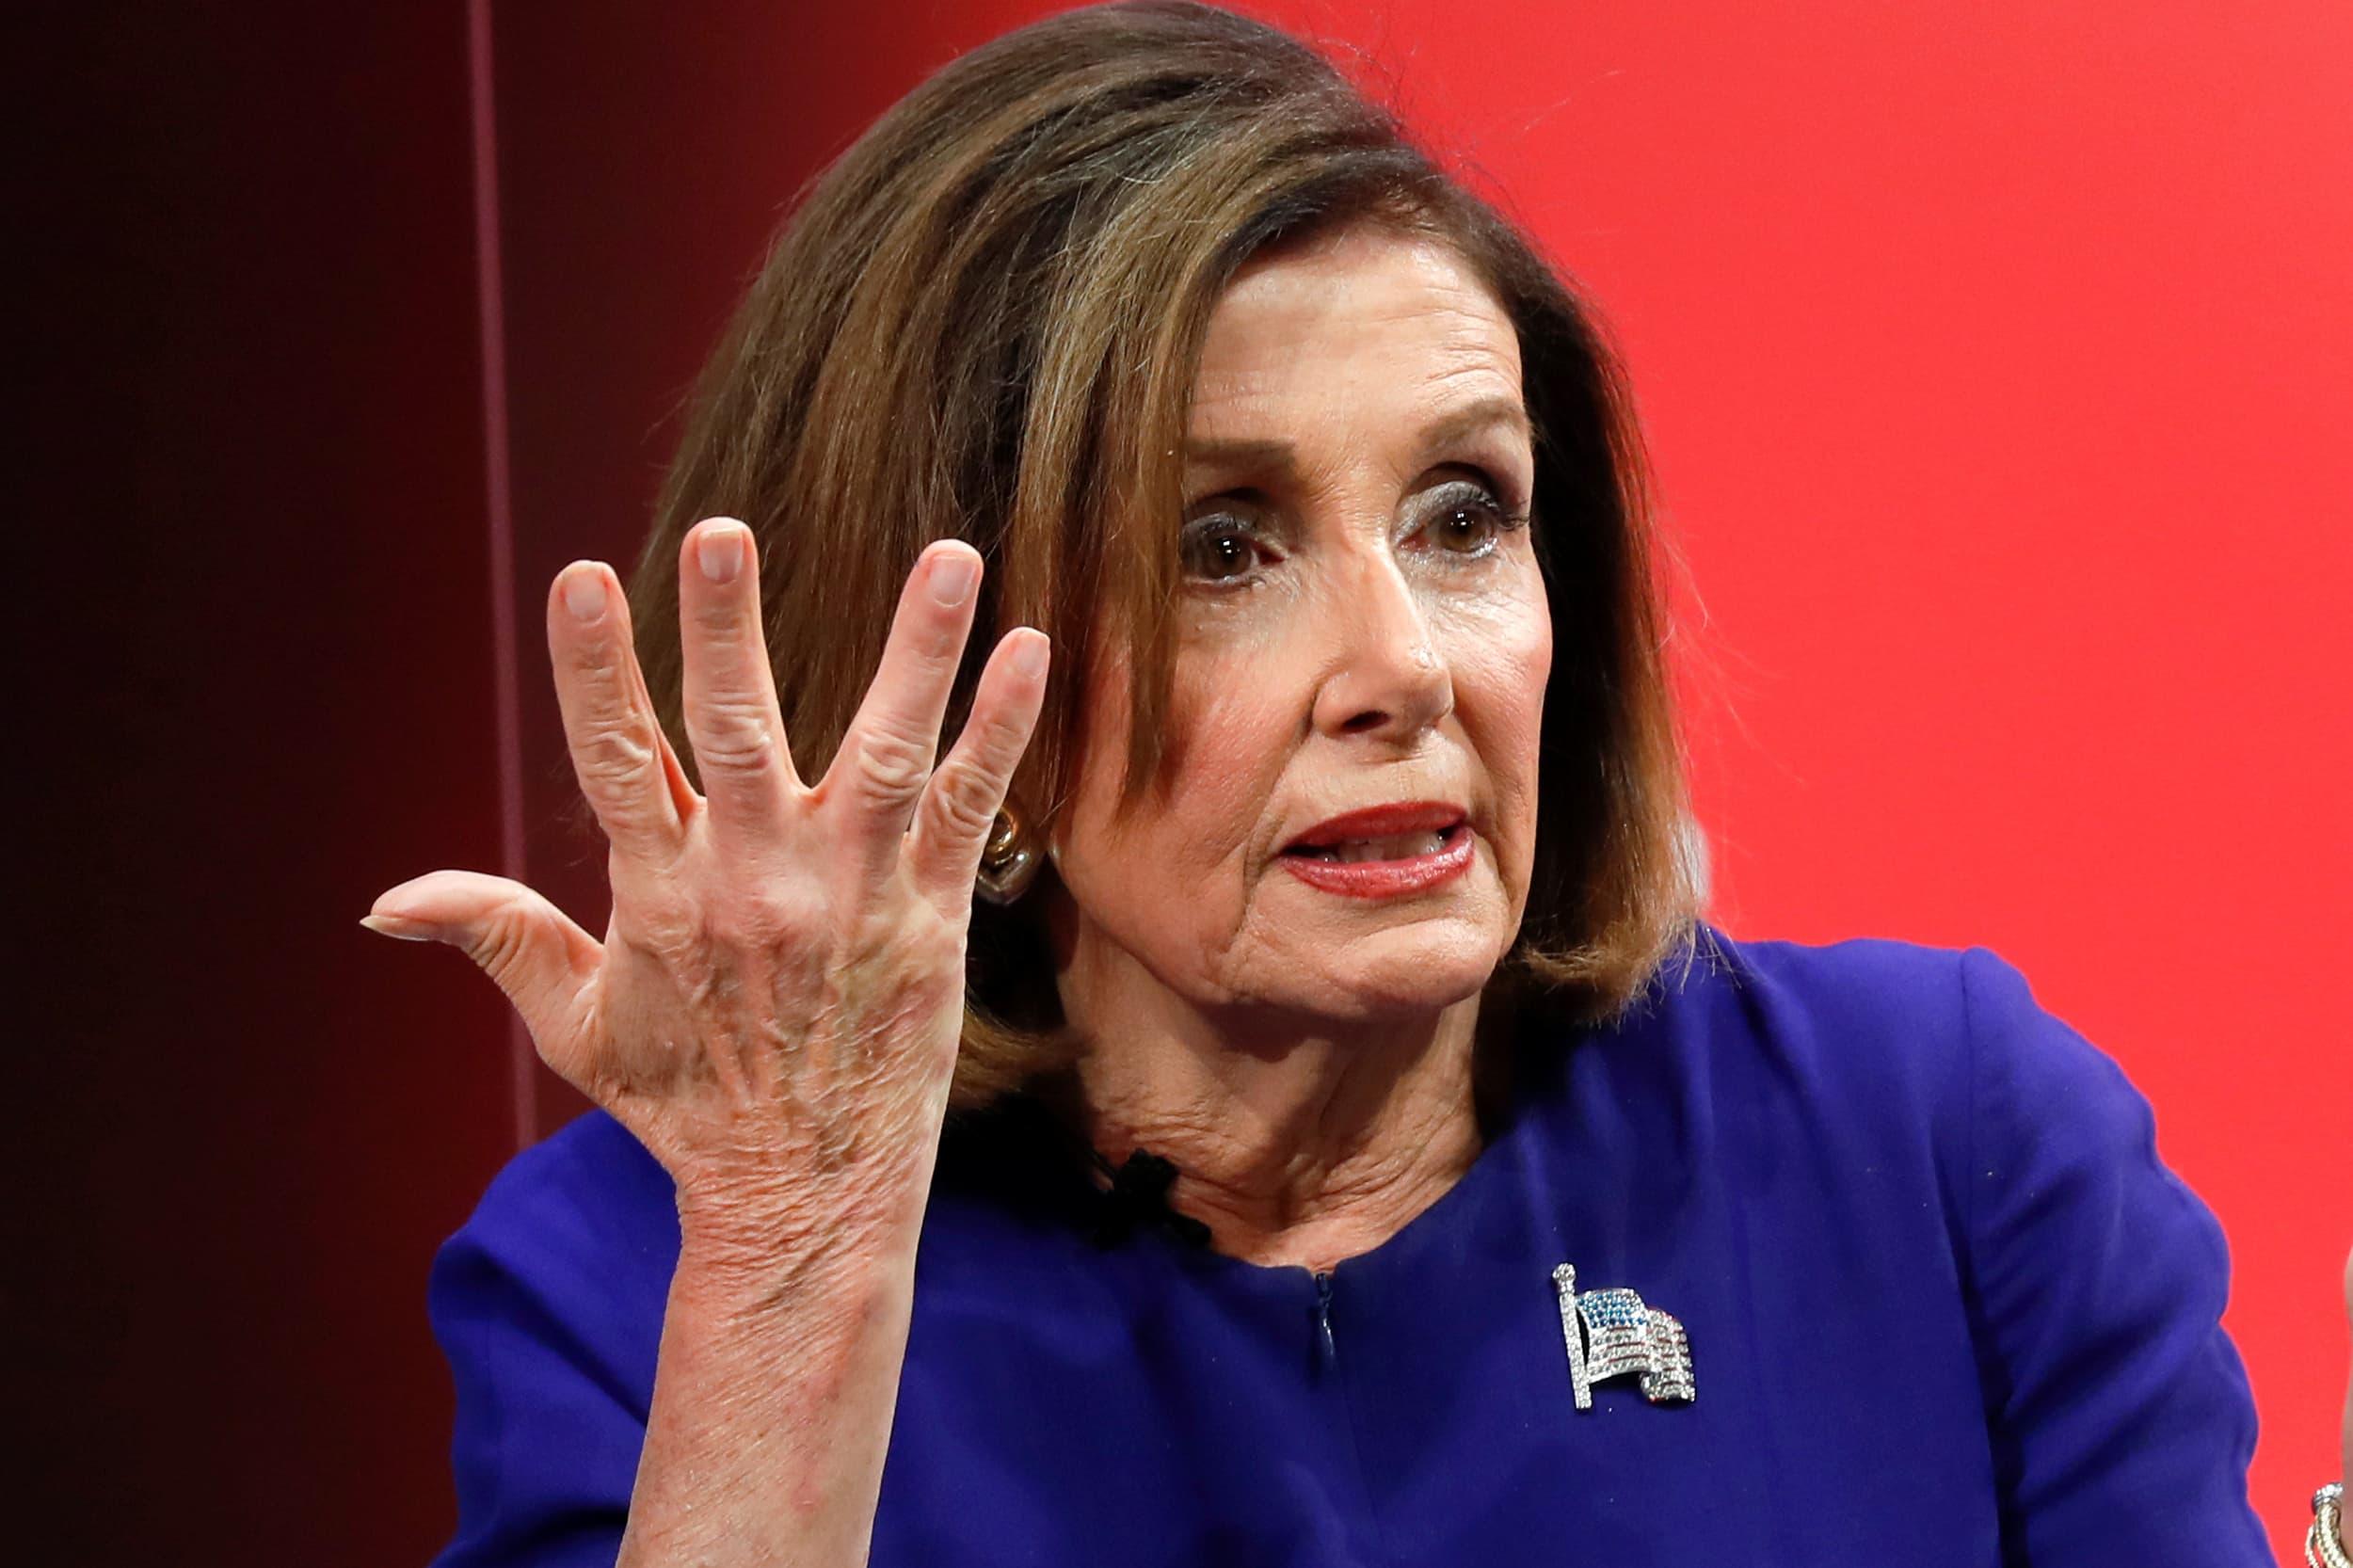 CBO says House Speaker Nancy Pelosi's drug pricing plan saves Medicare $345 billion over decade